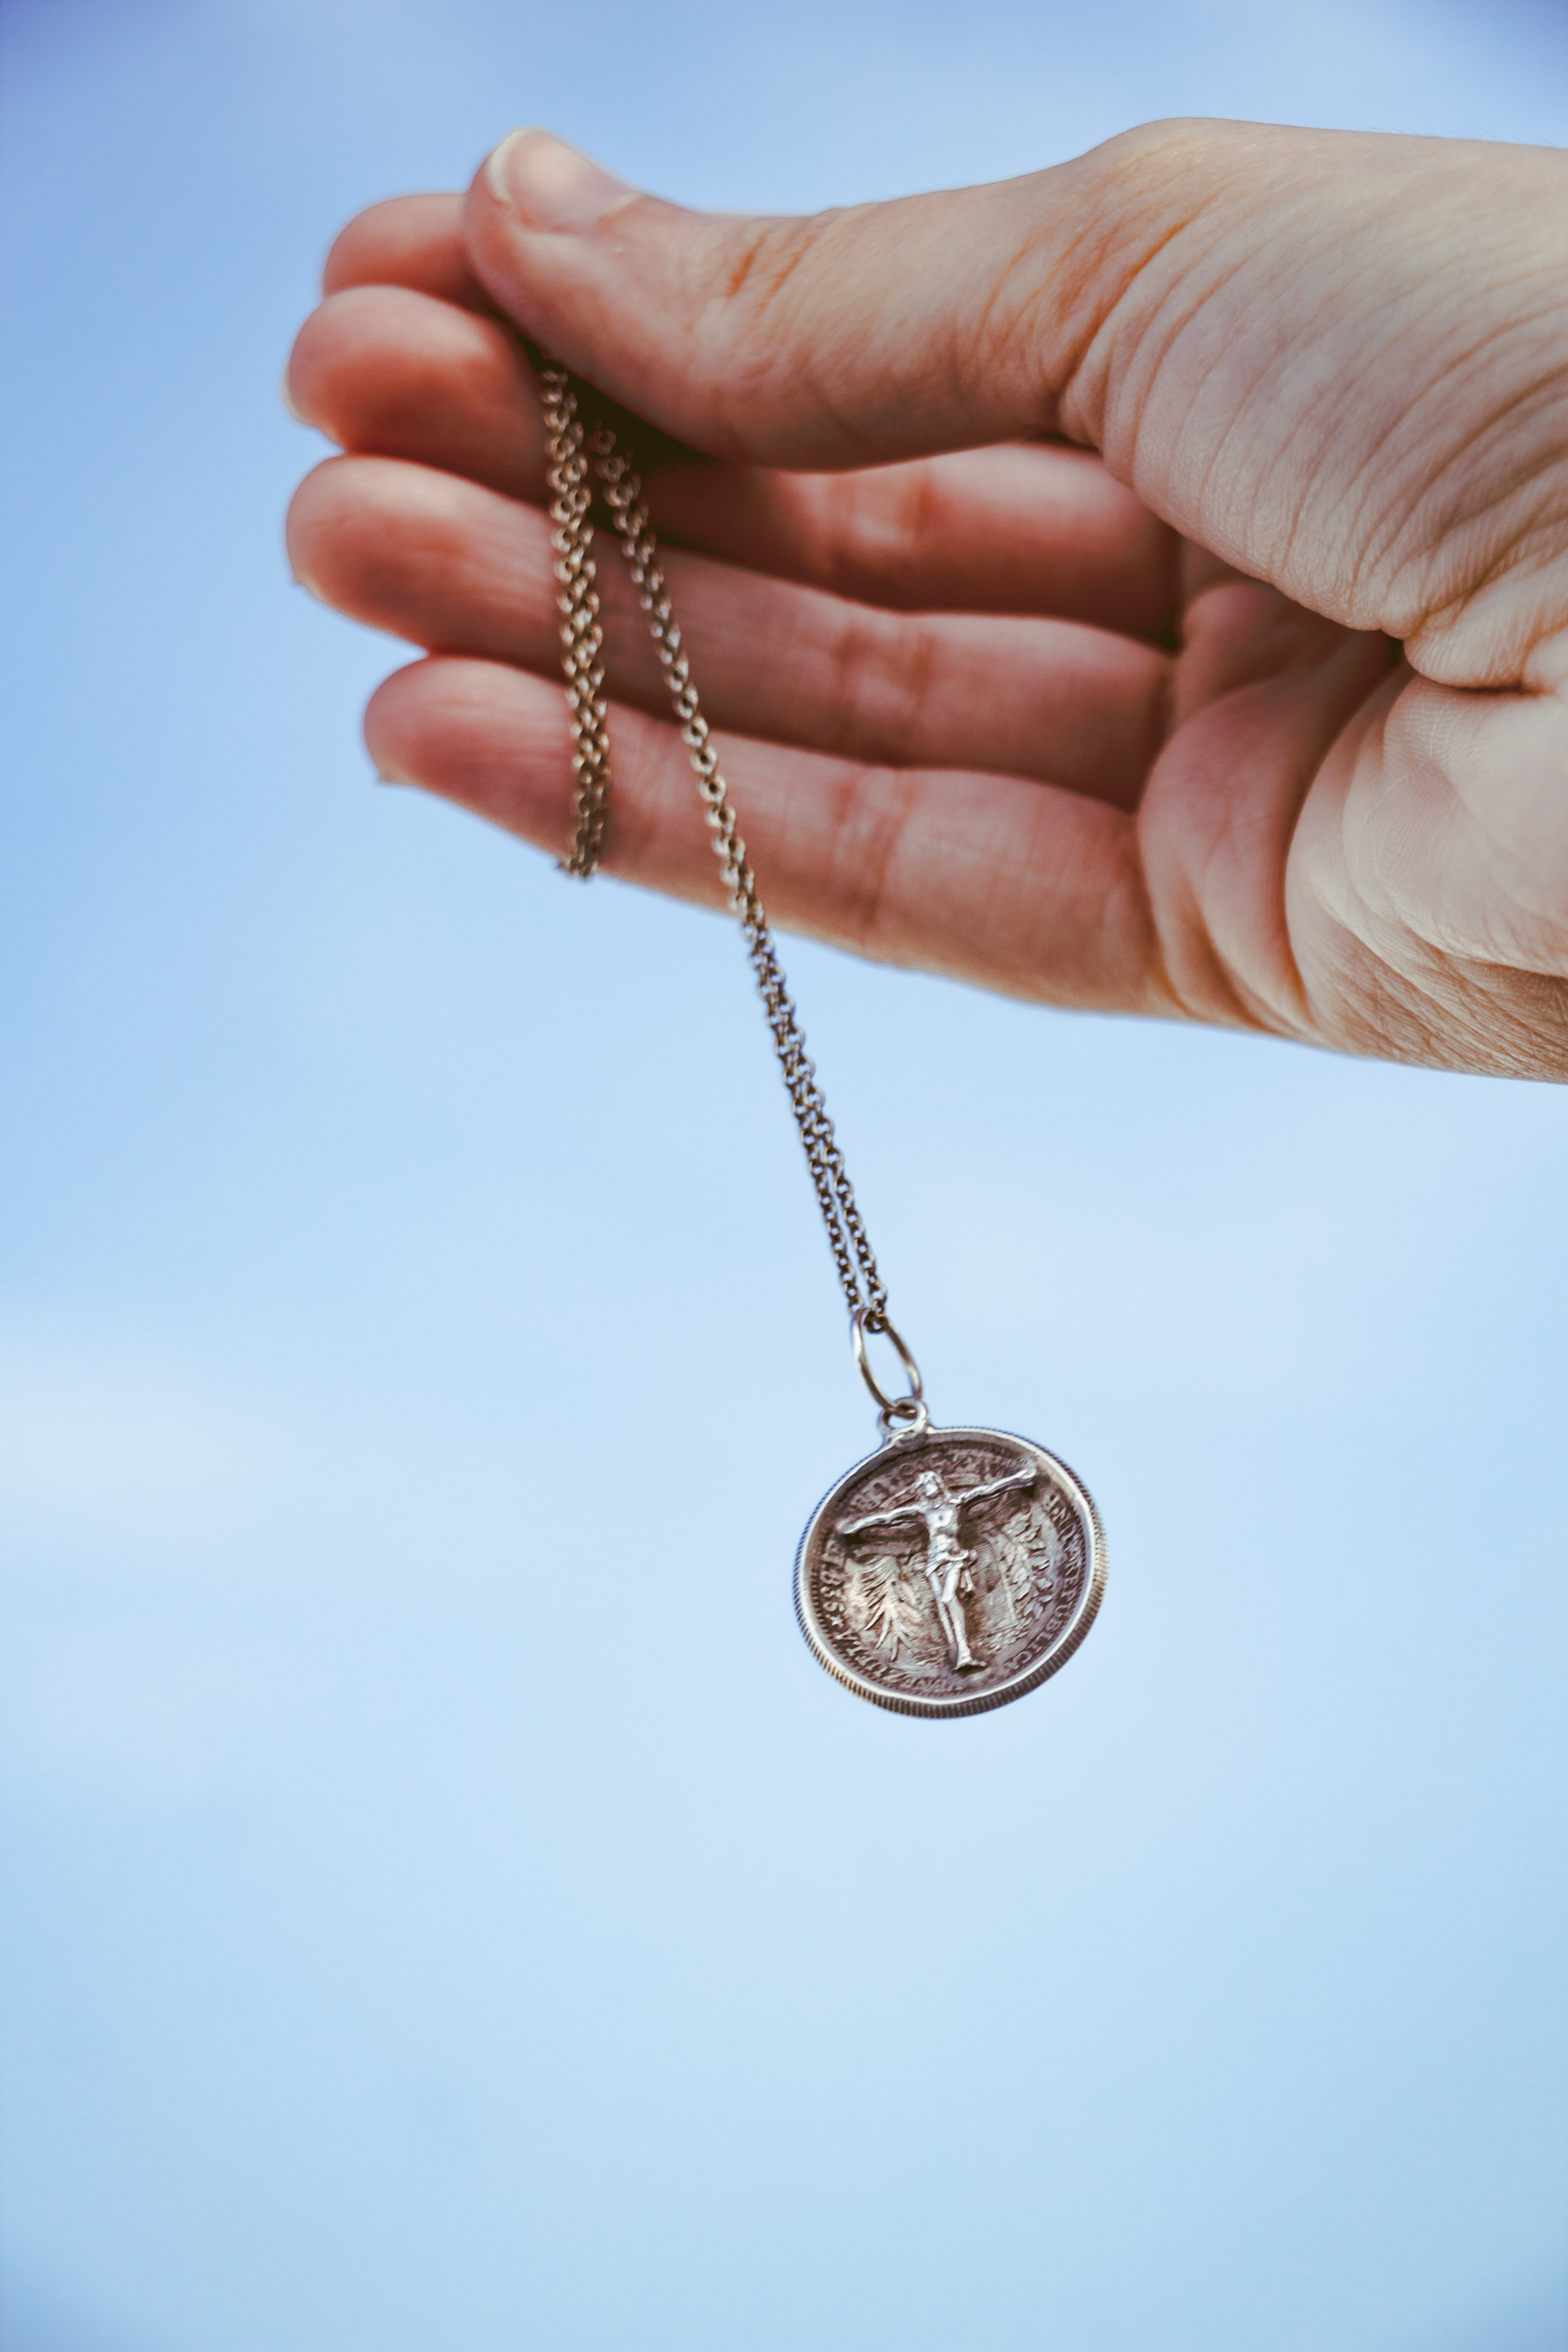 person holding pendant necklacec